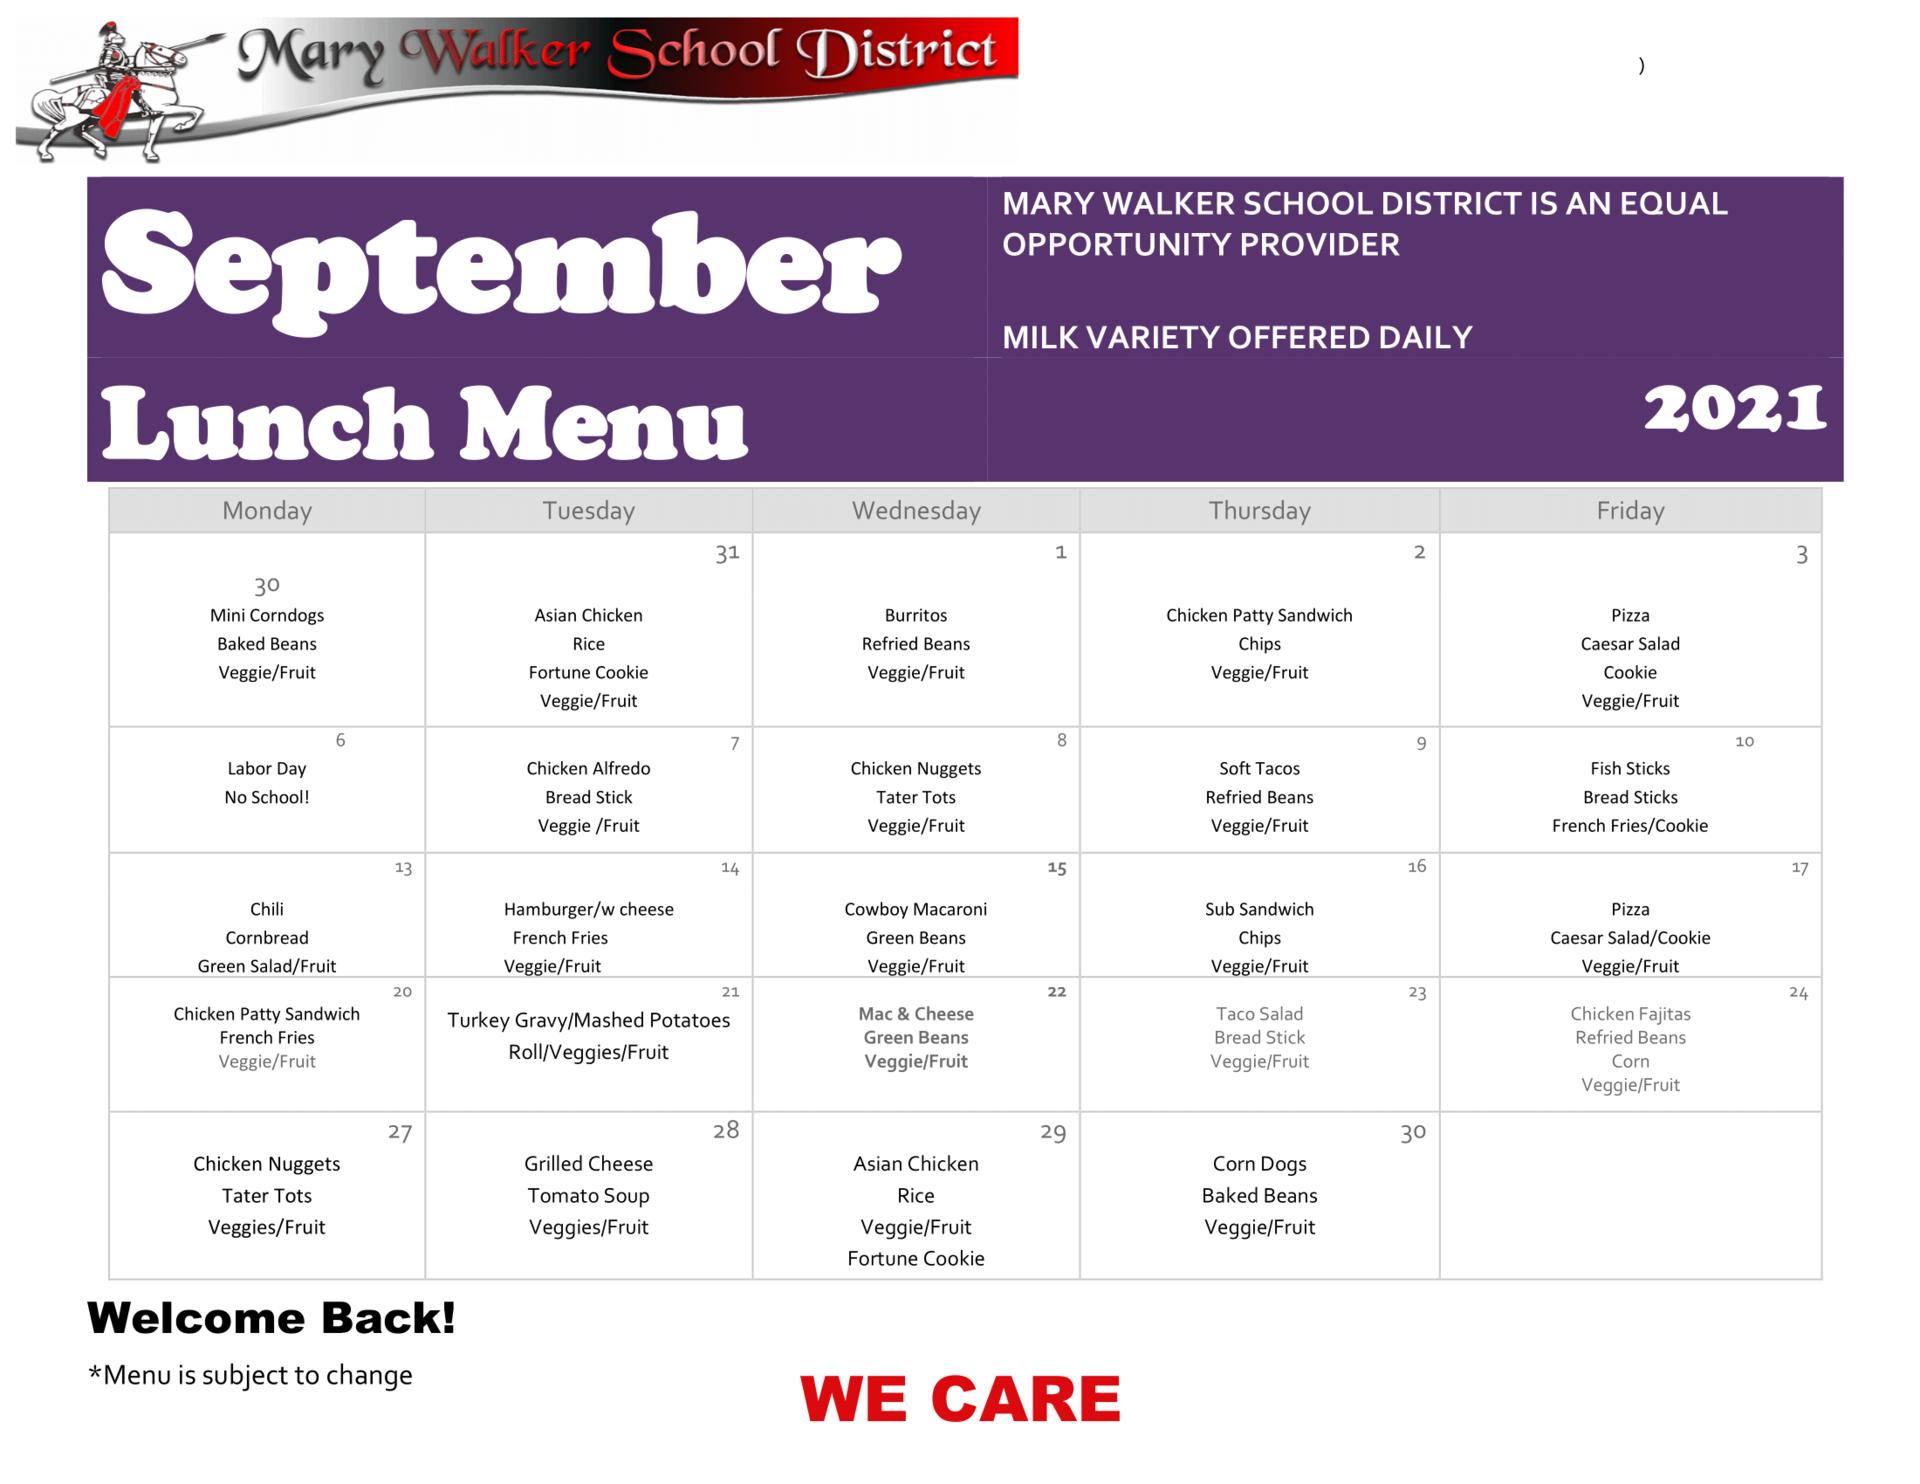 Image of September 2021 Lunch Menu